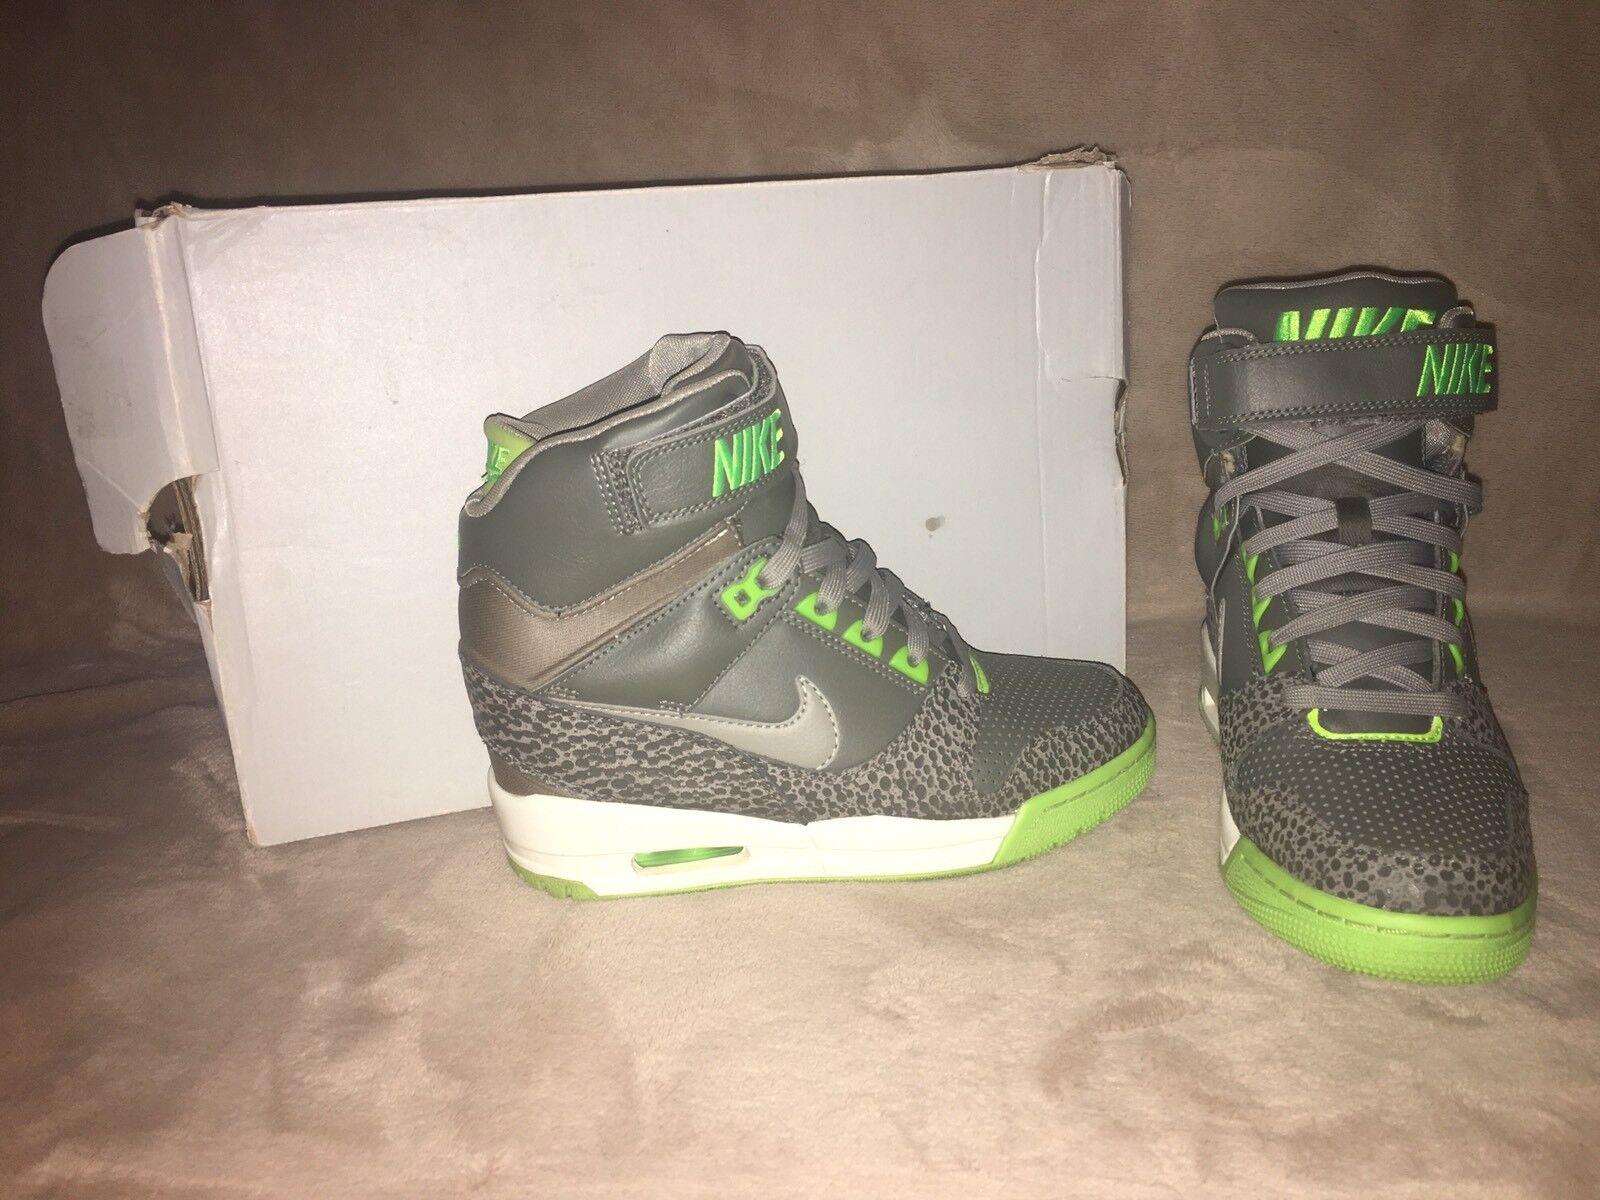 Nike Air Revolution Sky Hi Hidden Wedge Gray & Green Sz 6